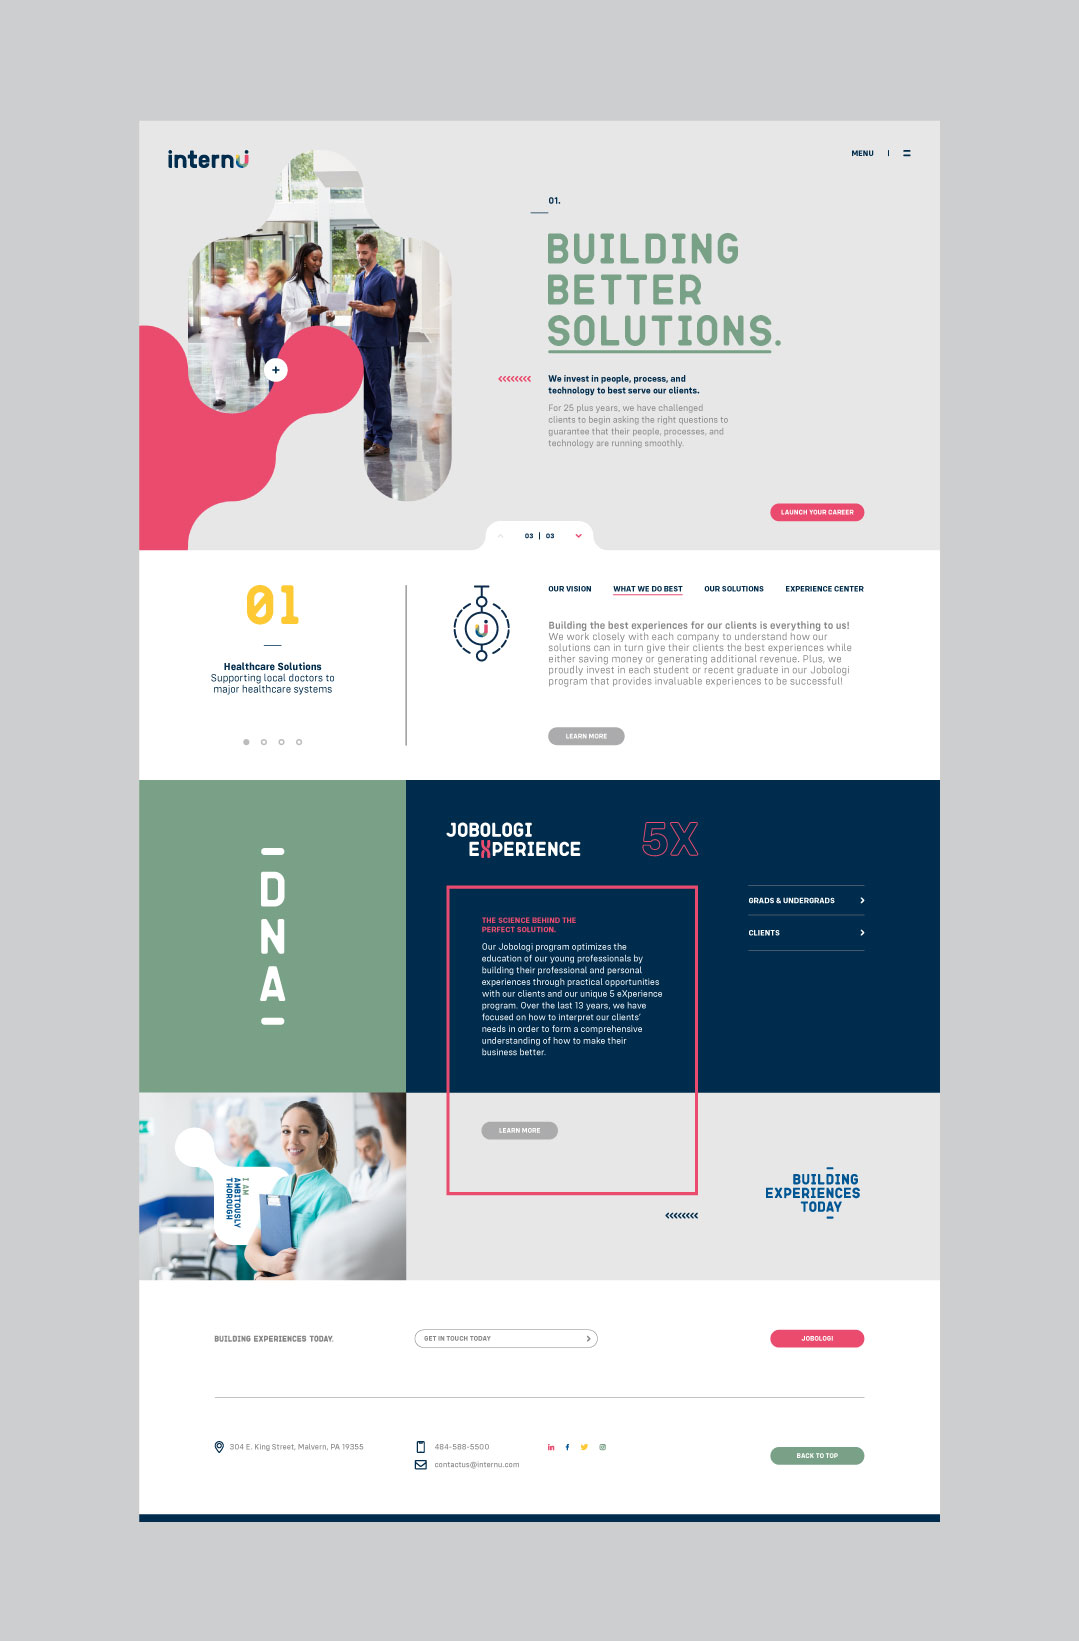 internU website showing the homepage design.